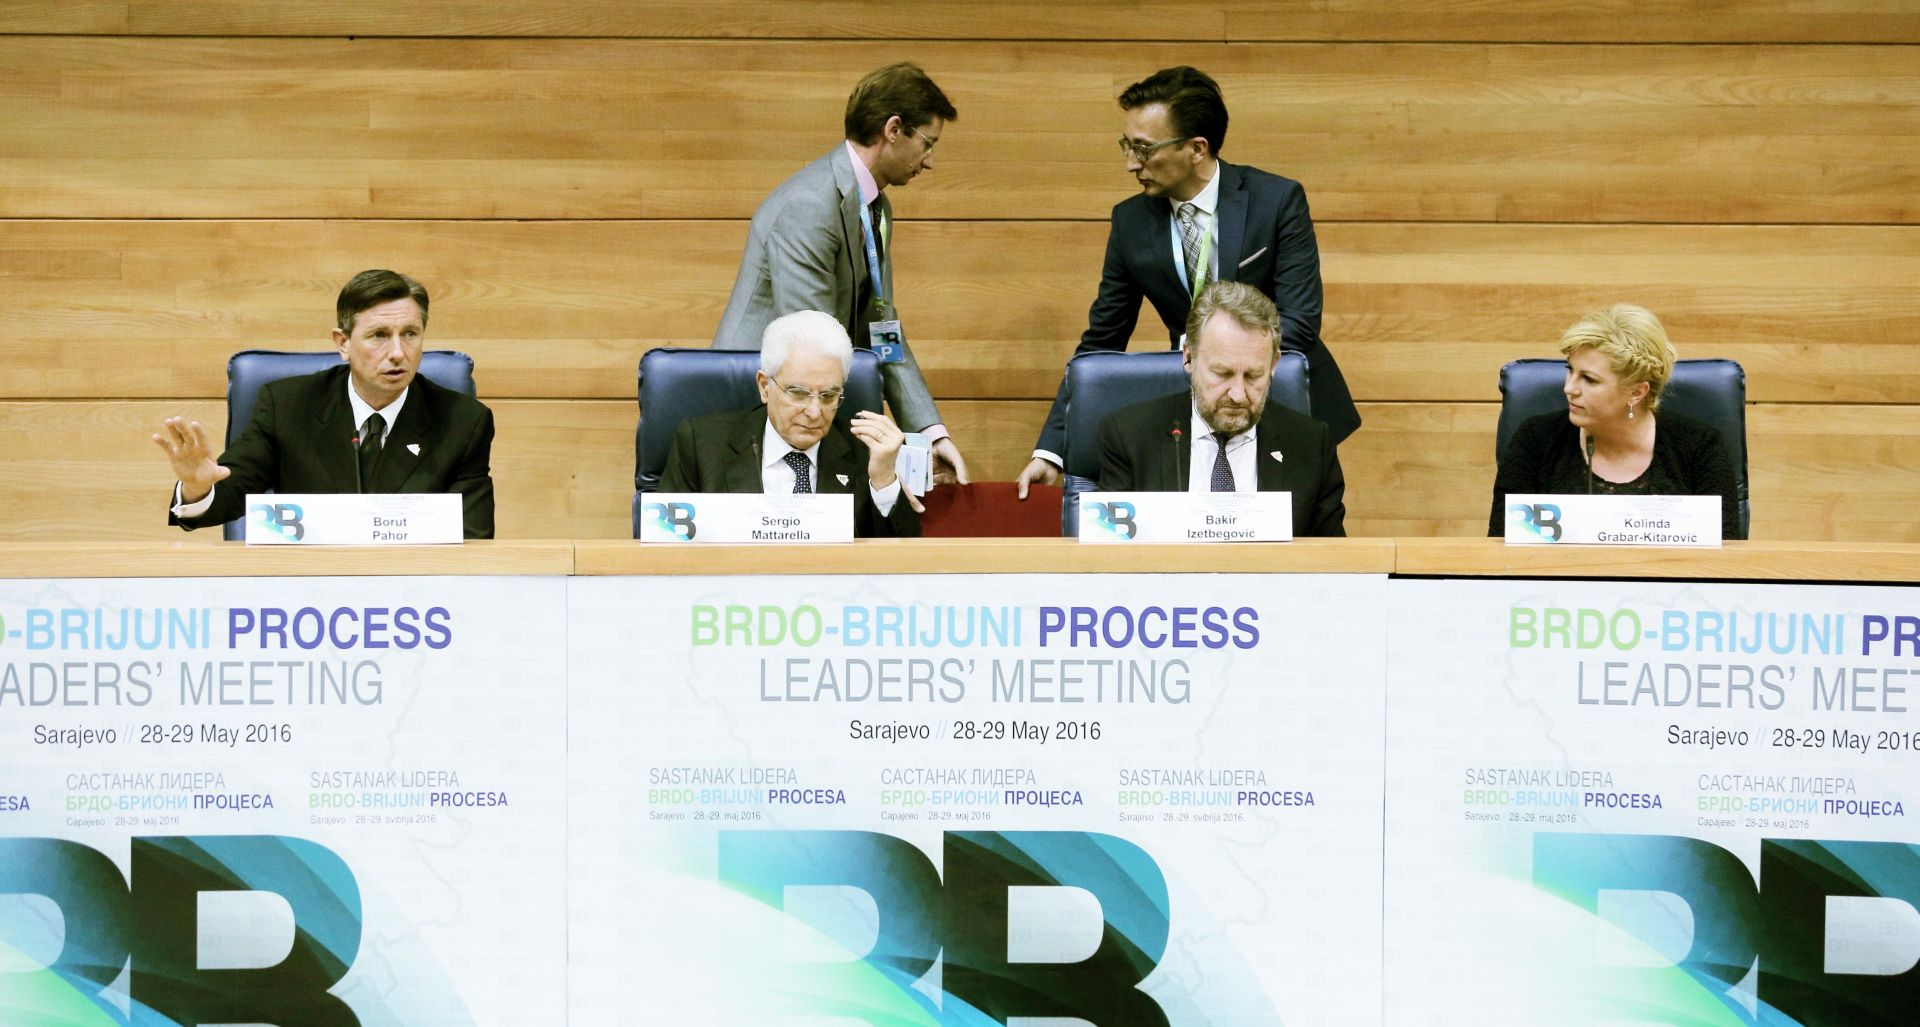 """Delo"" o sarajevskom summitu: Proces pomirenja na Balkanu usporen, treba se okrenuti gospodarstvu"